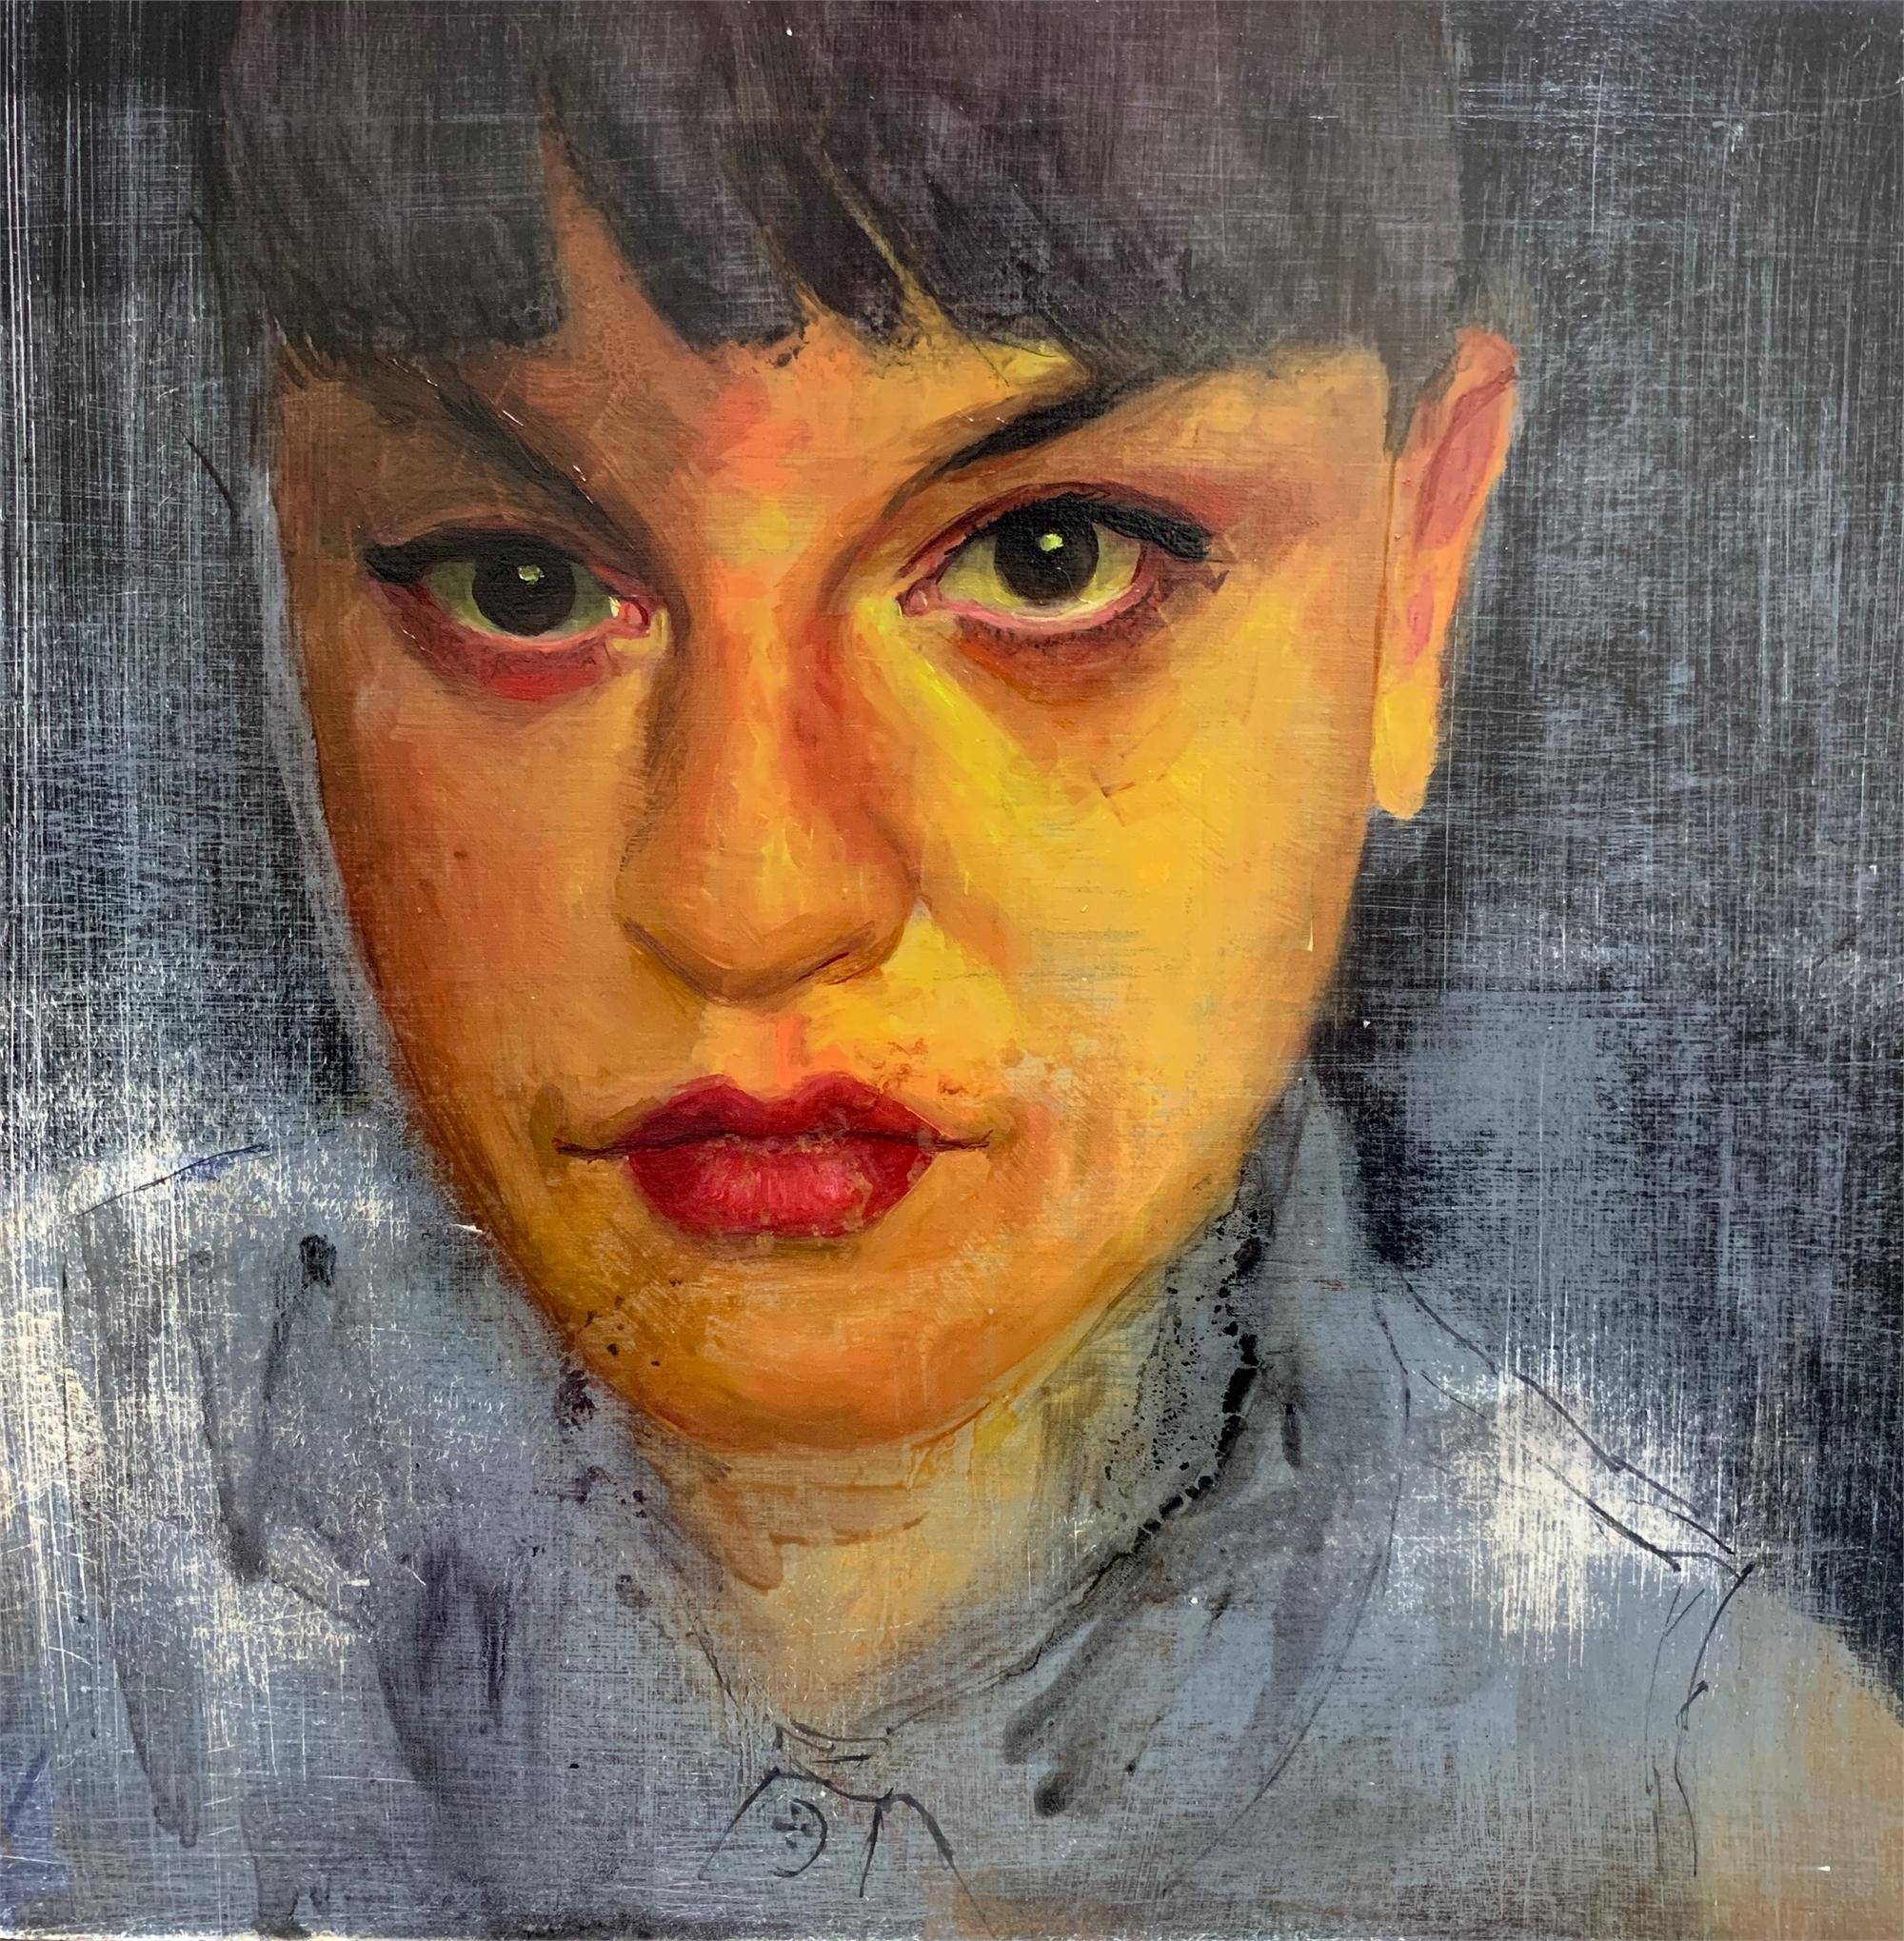 Self by Fikriye Oz